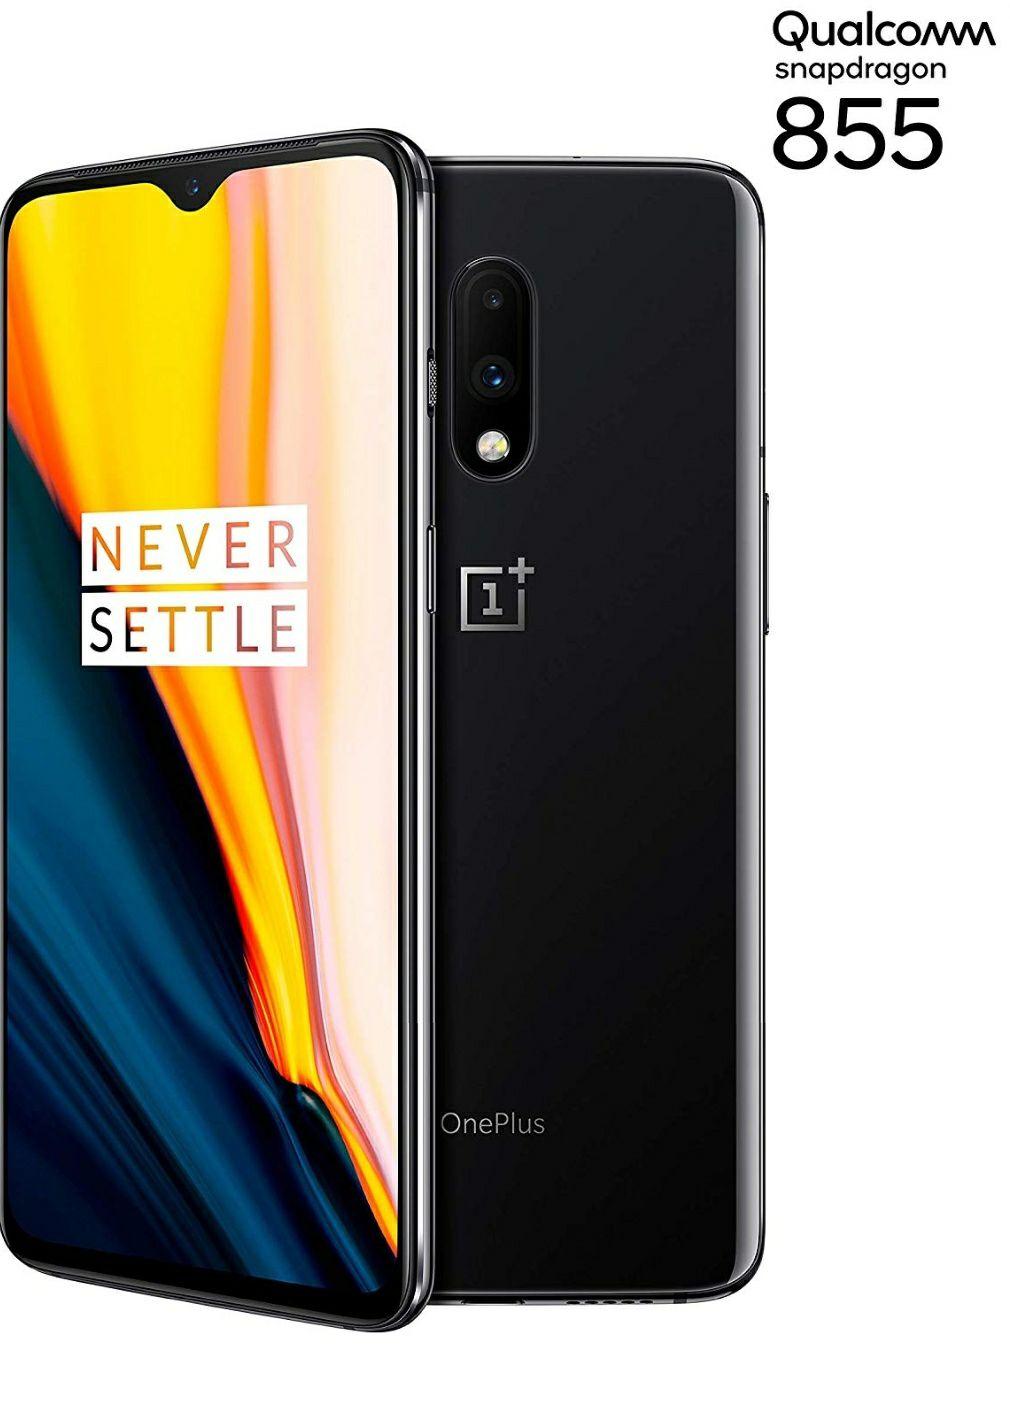 OnePlus 7 Smartphone Mirror Gray (16.3 cm) AMOLED Display 8 GB RAM + 256 GB Memory, Dual Camera (48 MP) - Dual SIM - £392.48 @ Amazon De